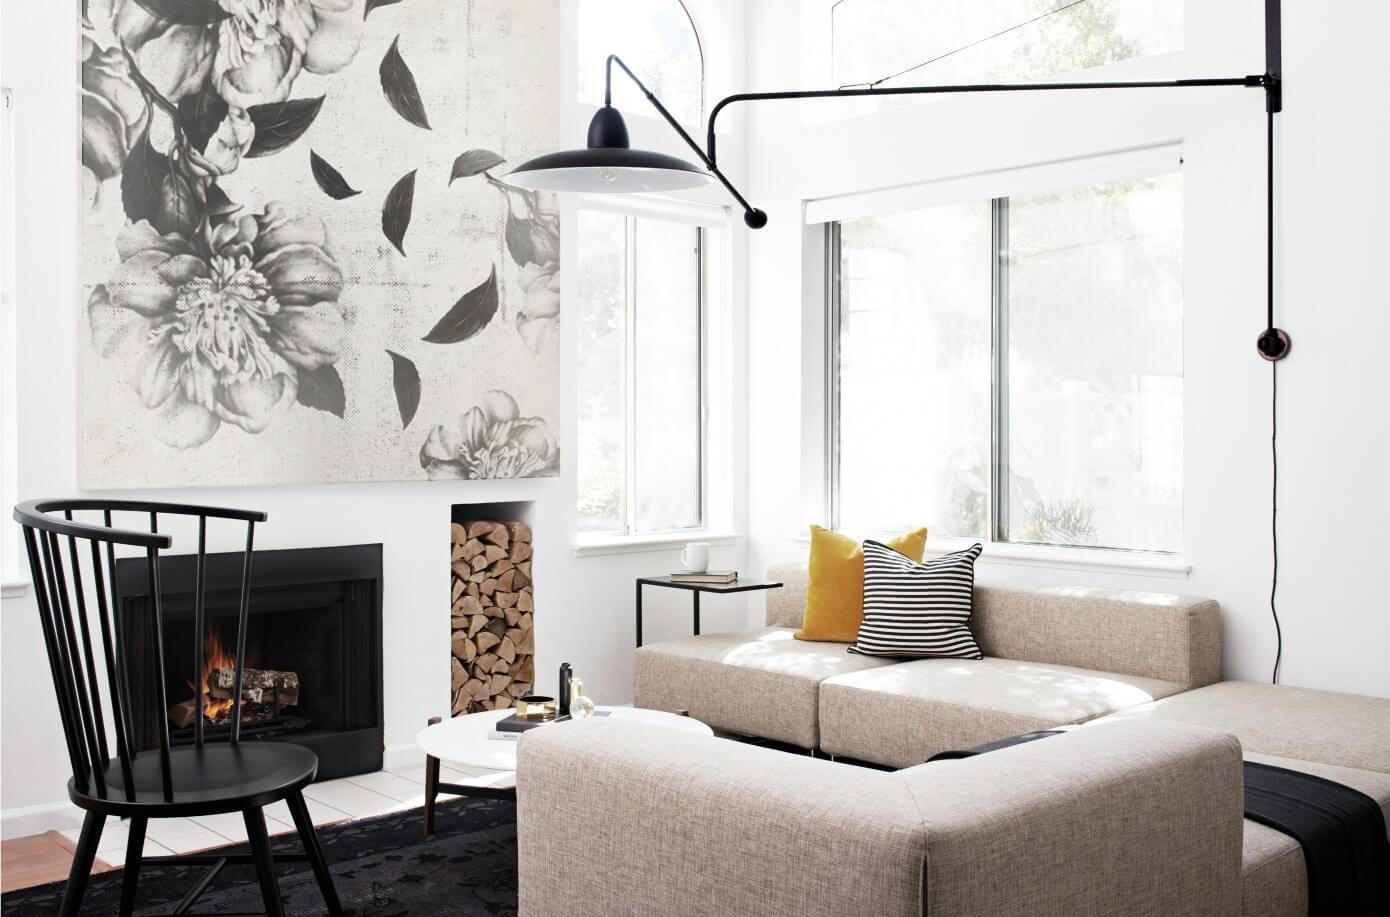 Modern Scandinavian Fireplace: Mountain View Townhouse By Studio Revolution « HomeAdore